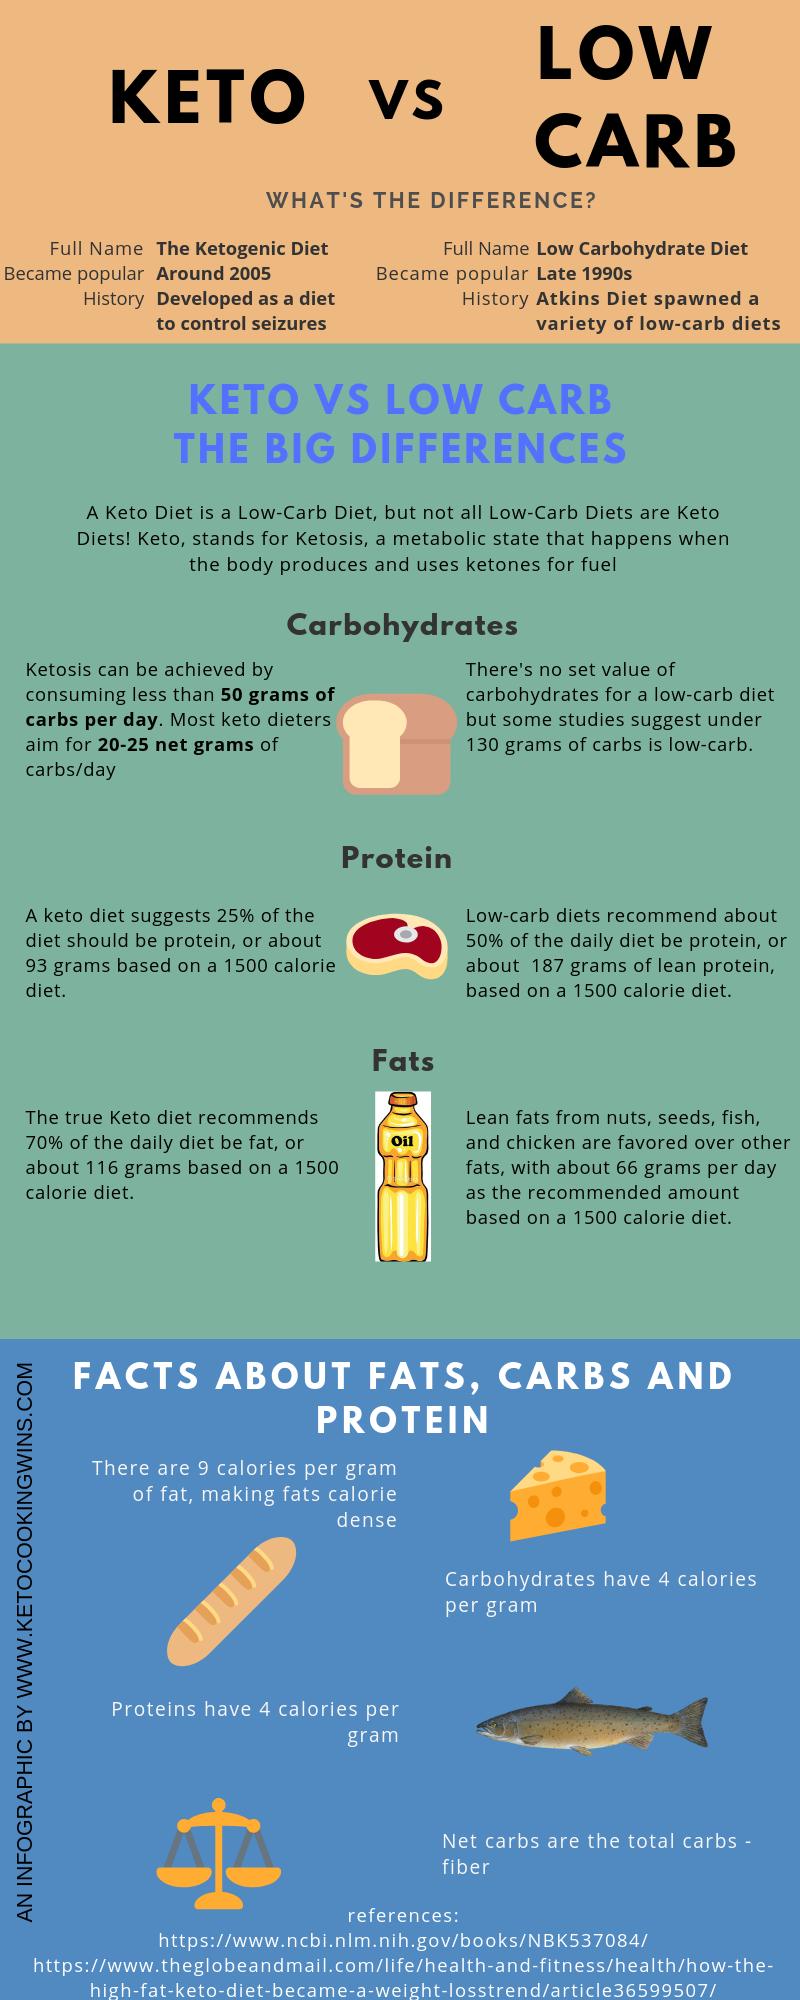 keto diet fat vs protien vs carbs